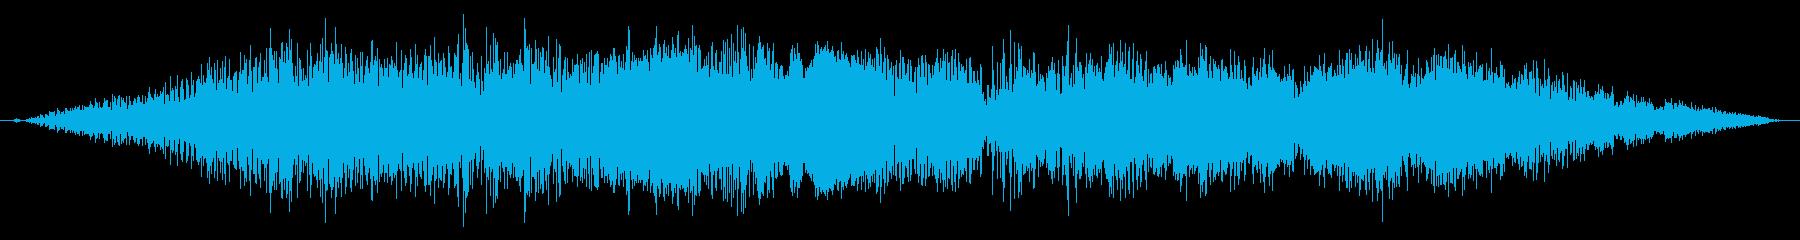 【F1】超ド迫力のF1エンジン効果音7!の再生済みの波形